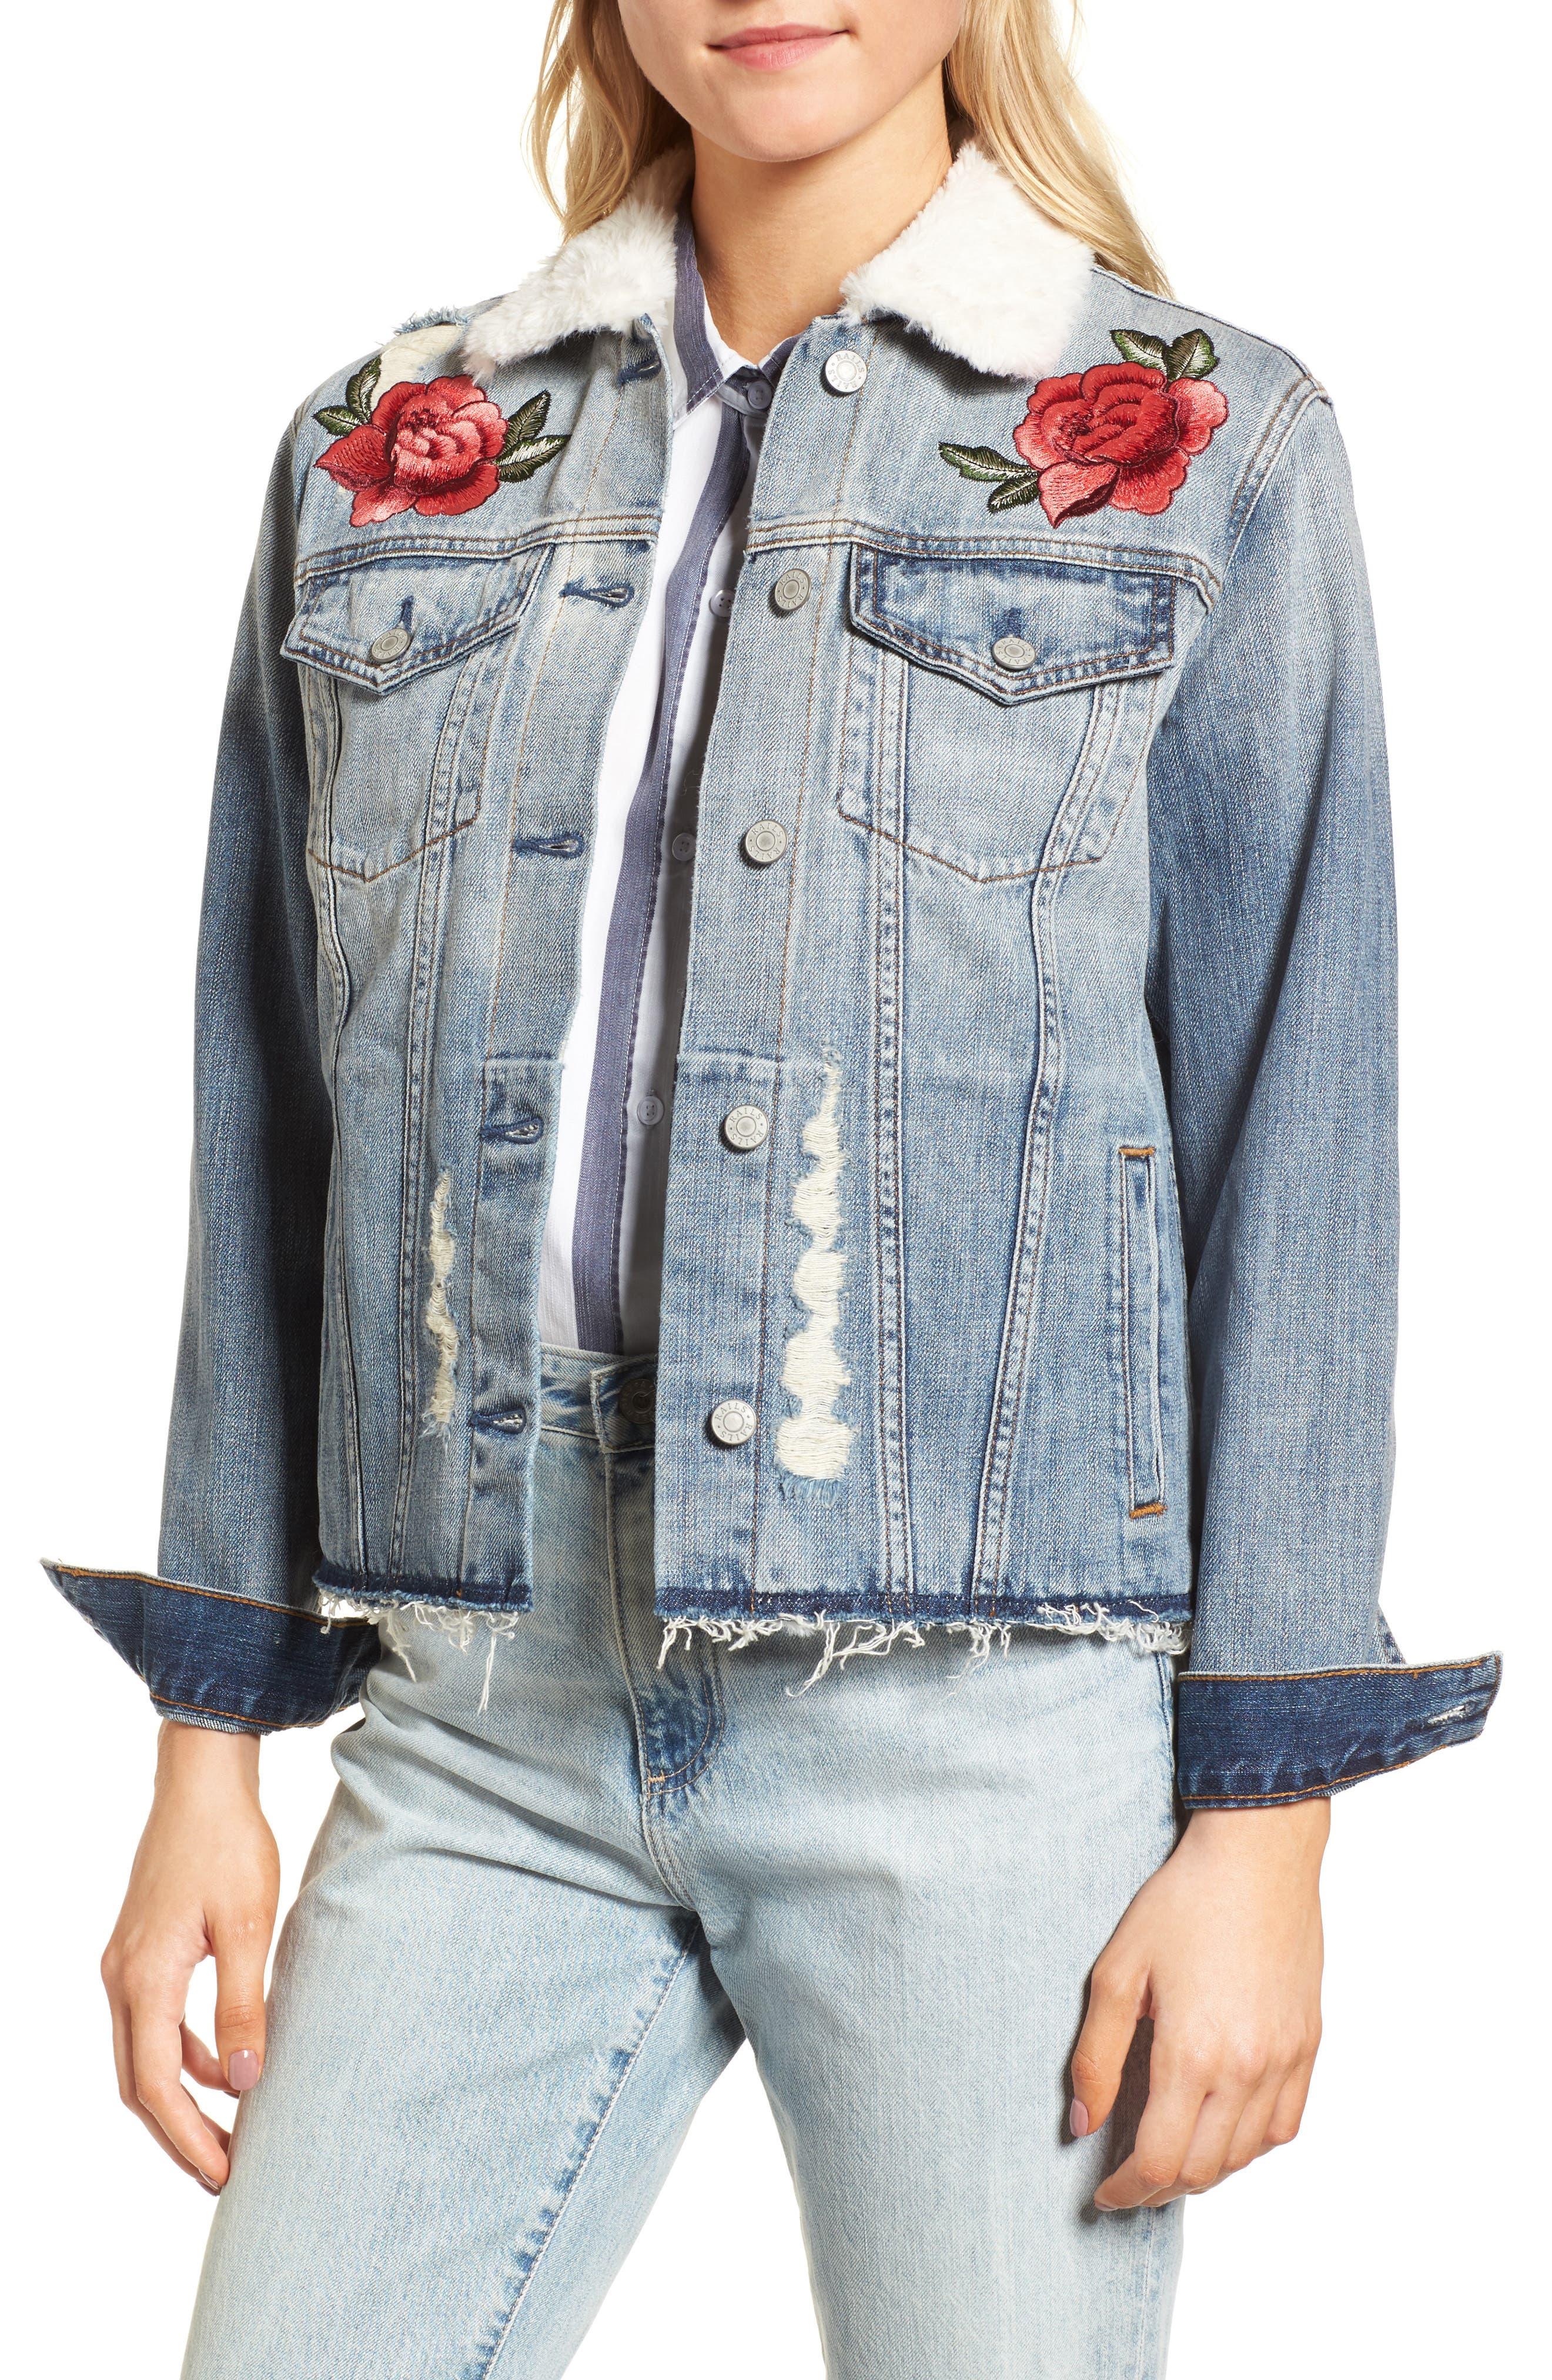 Alternate Image 1 Selected - Rails Ramsey Embroidered Denim Jacket